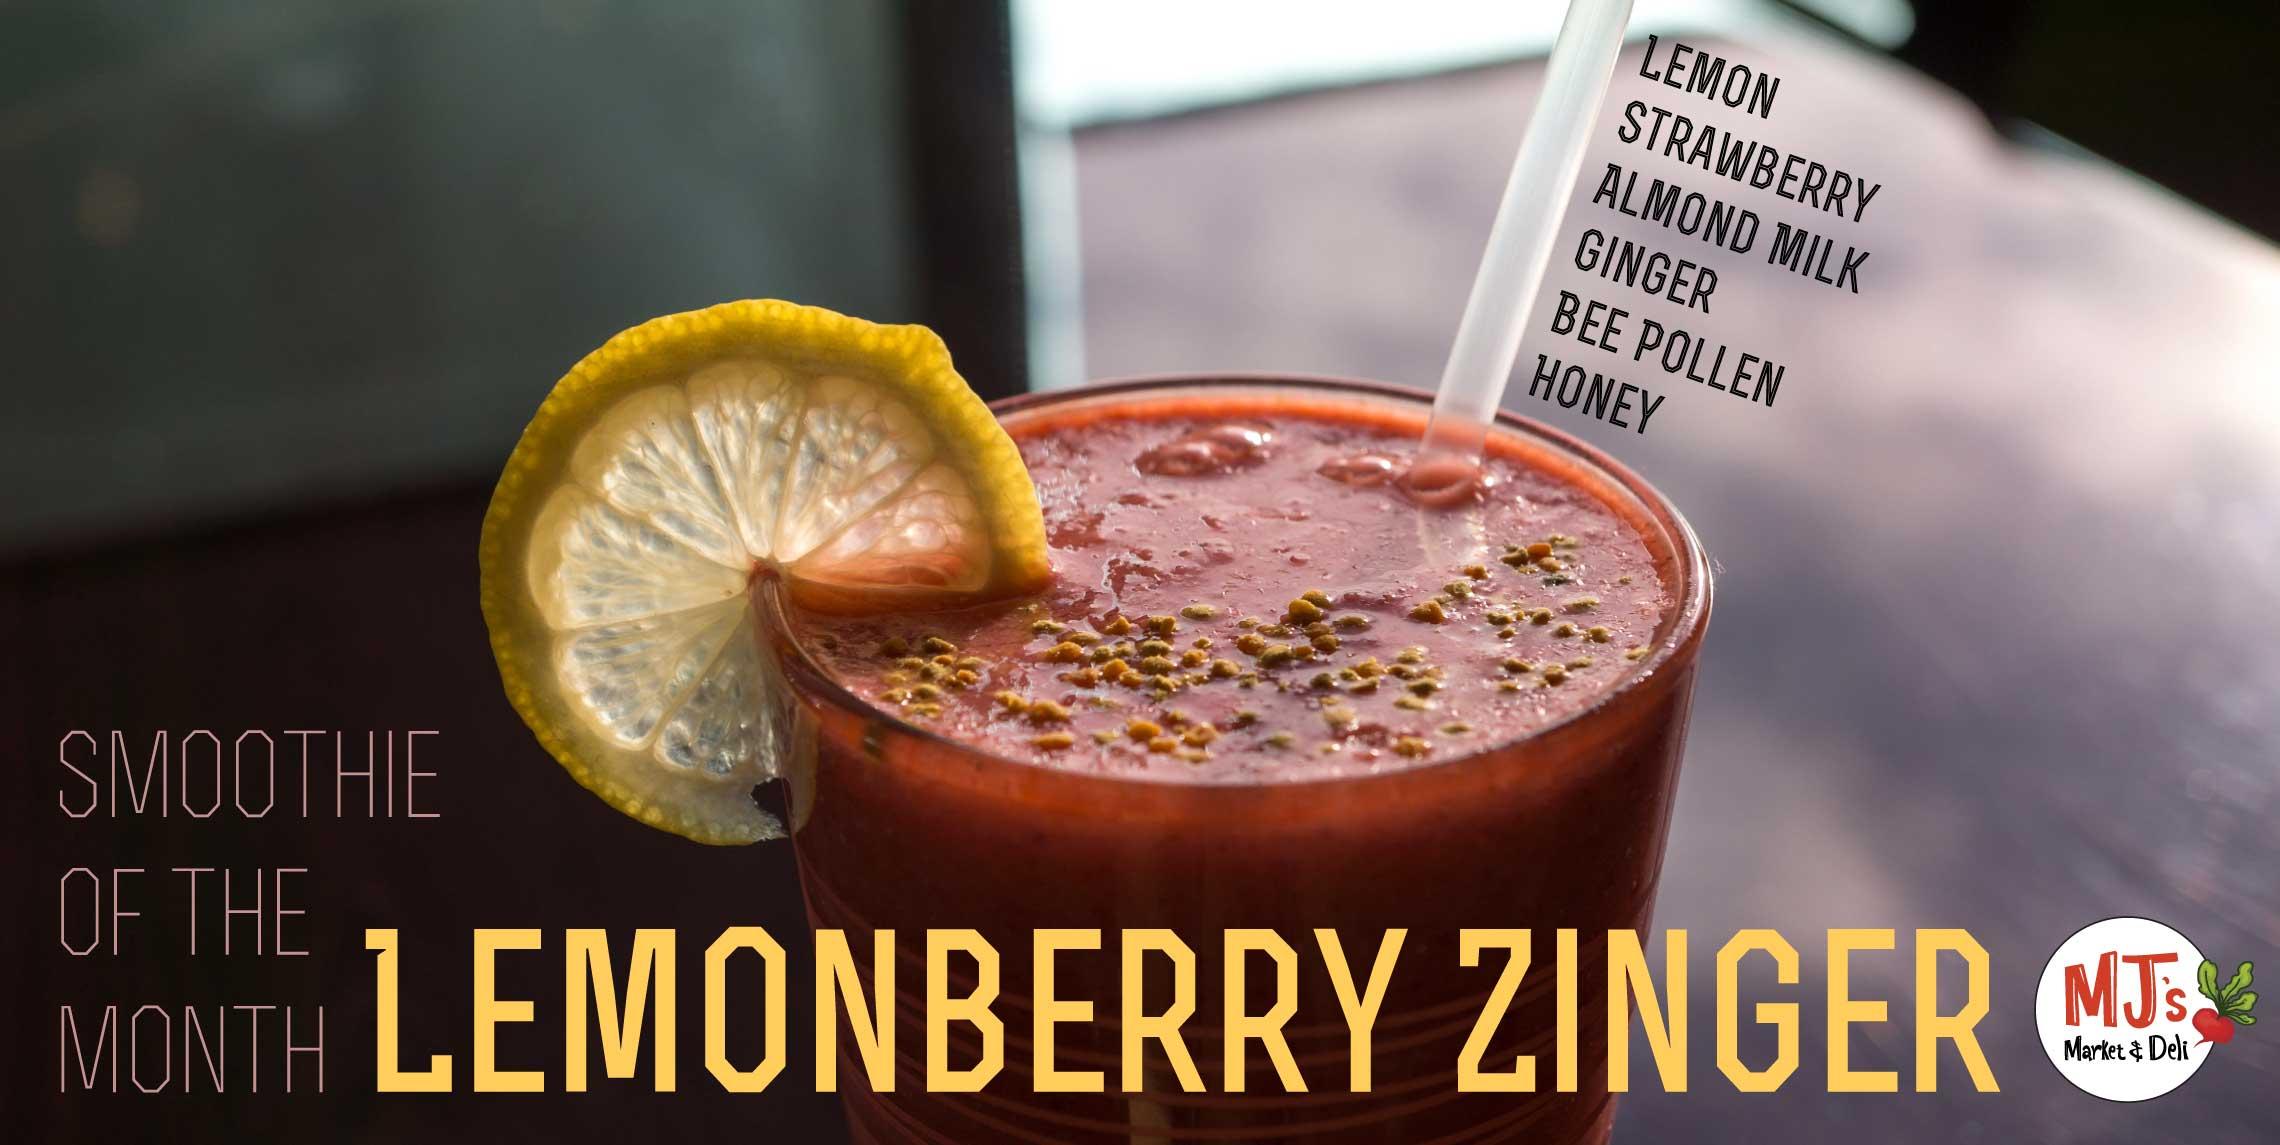 Lemonberry Zinger